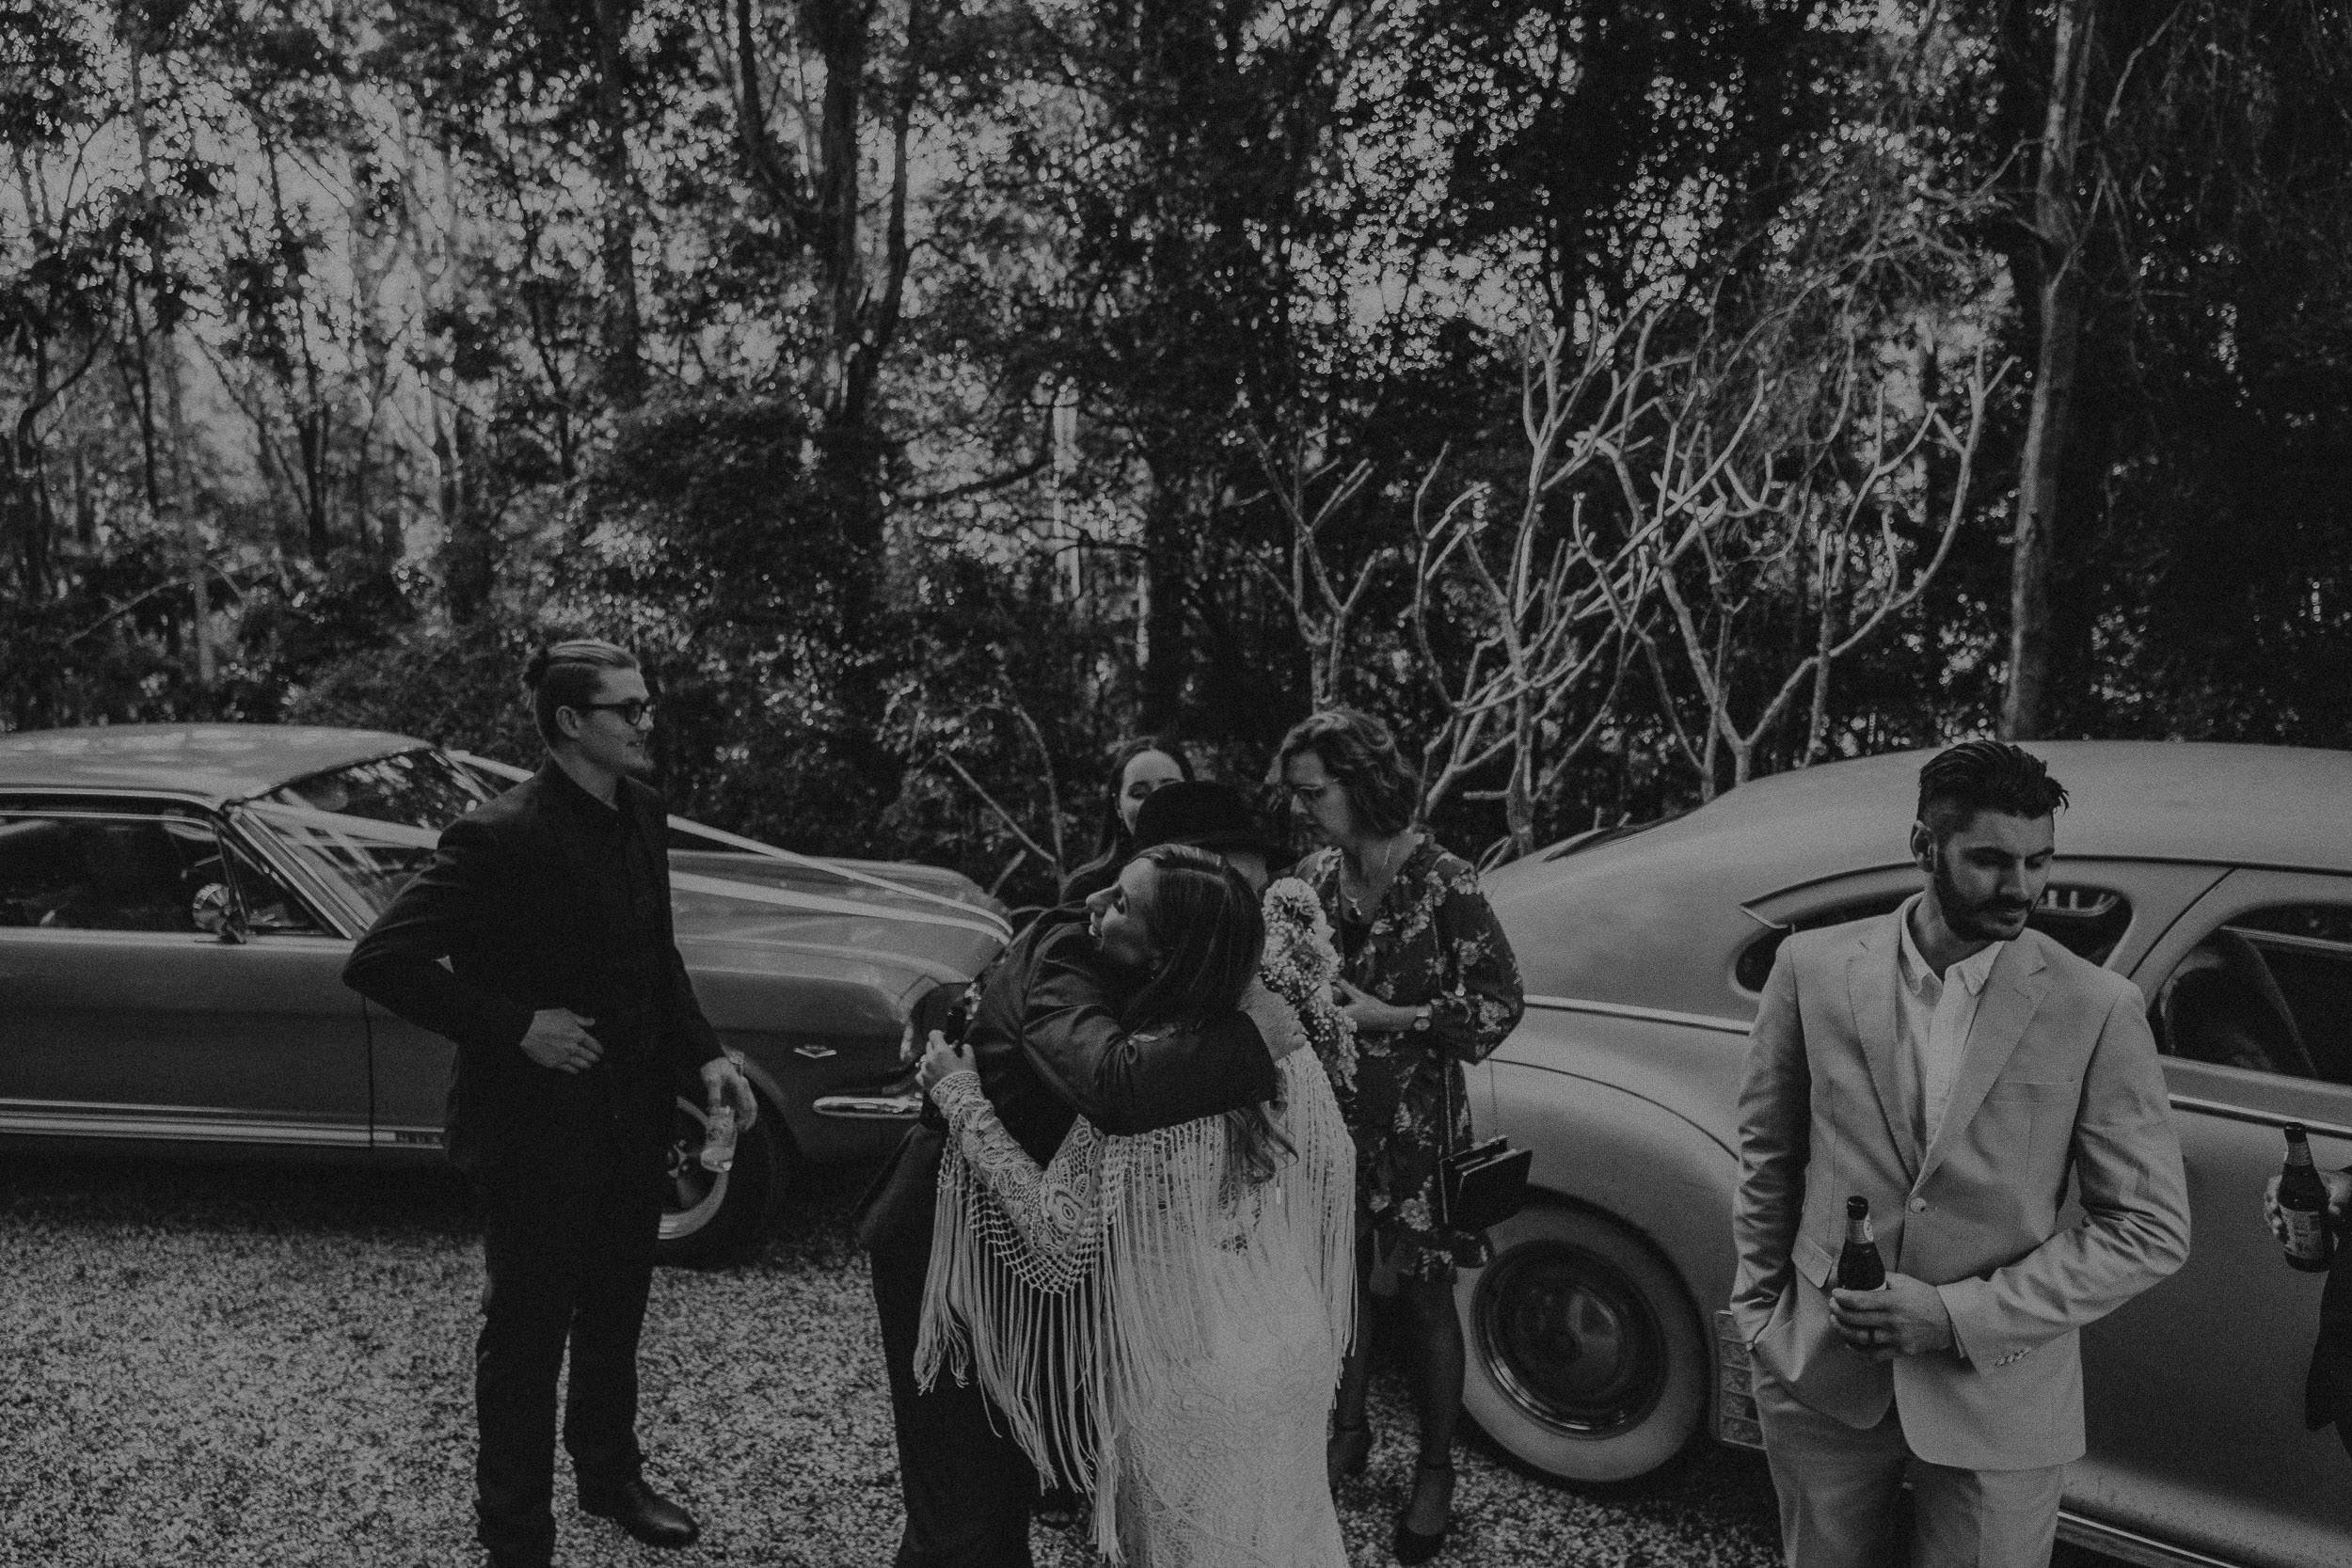 S&A Elopement - Kings & Thieves - Shred 'Til Dead - Central Coast Beach Forest Wedding - 329.jpg